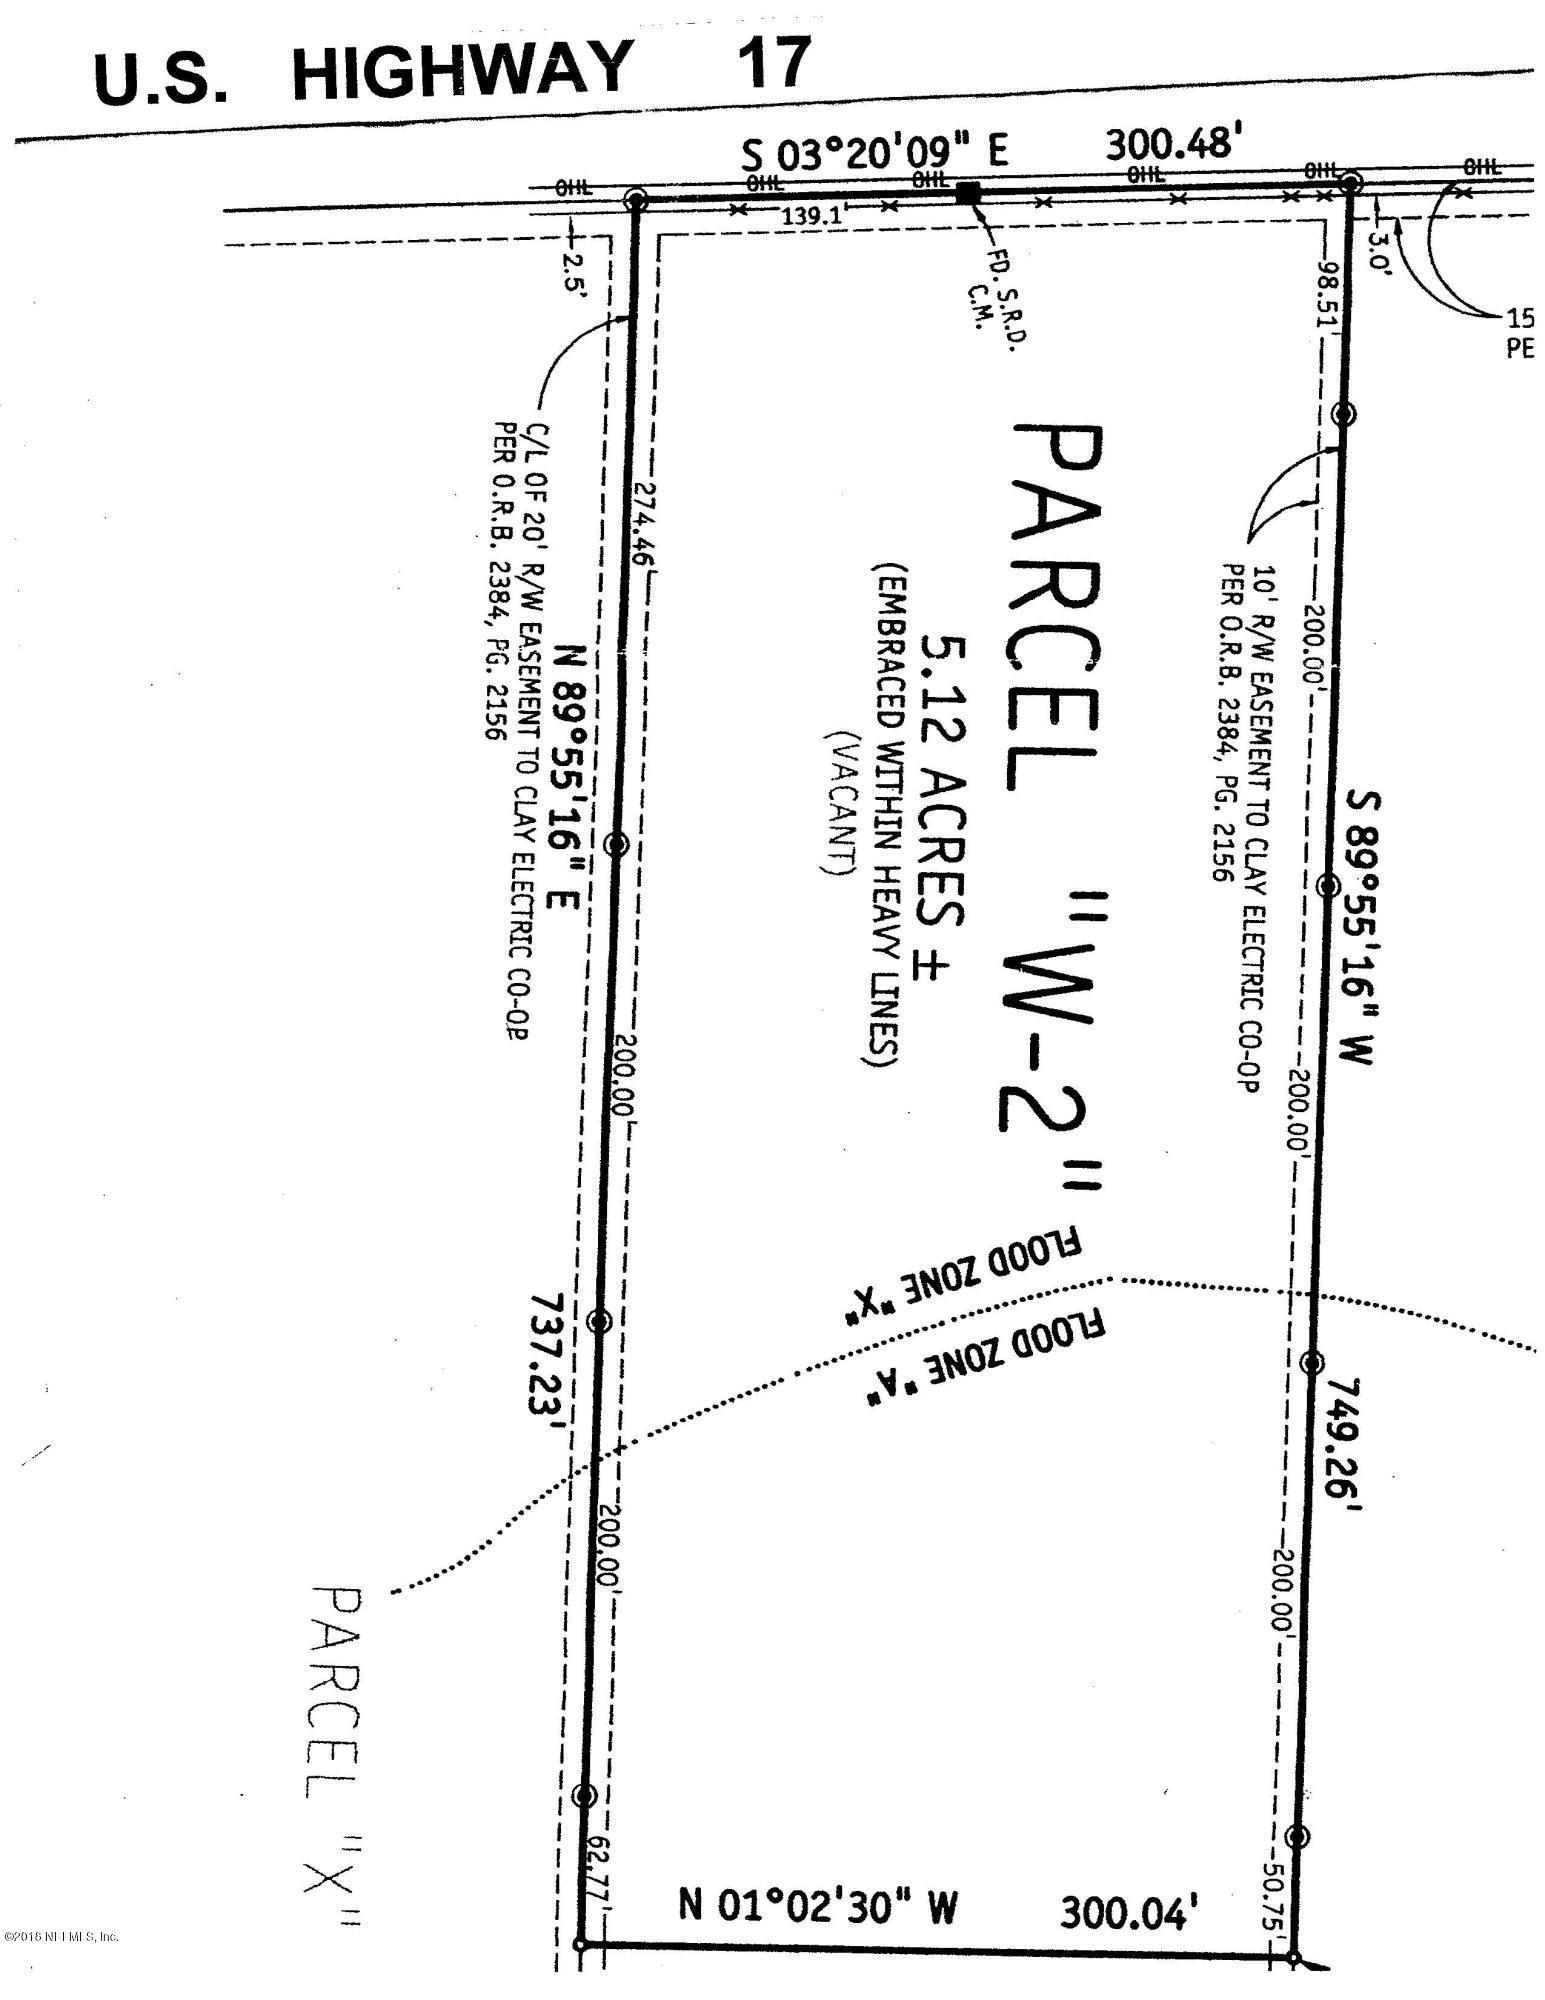 O U.s. Highway 17 South Green Cove Springs, FL 32043